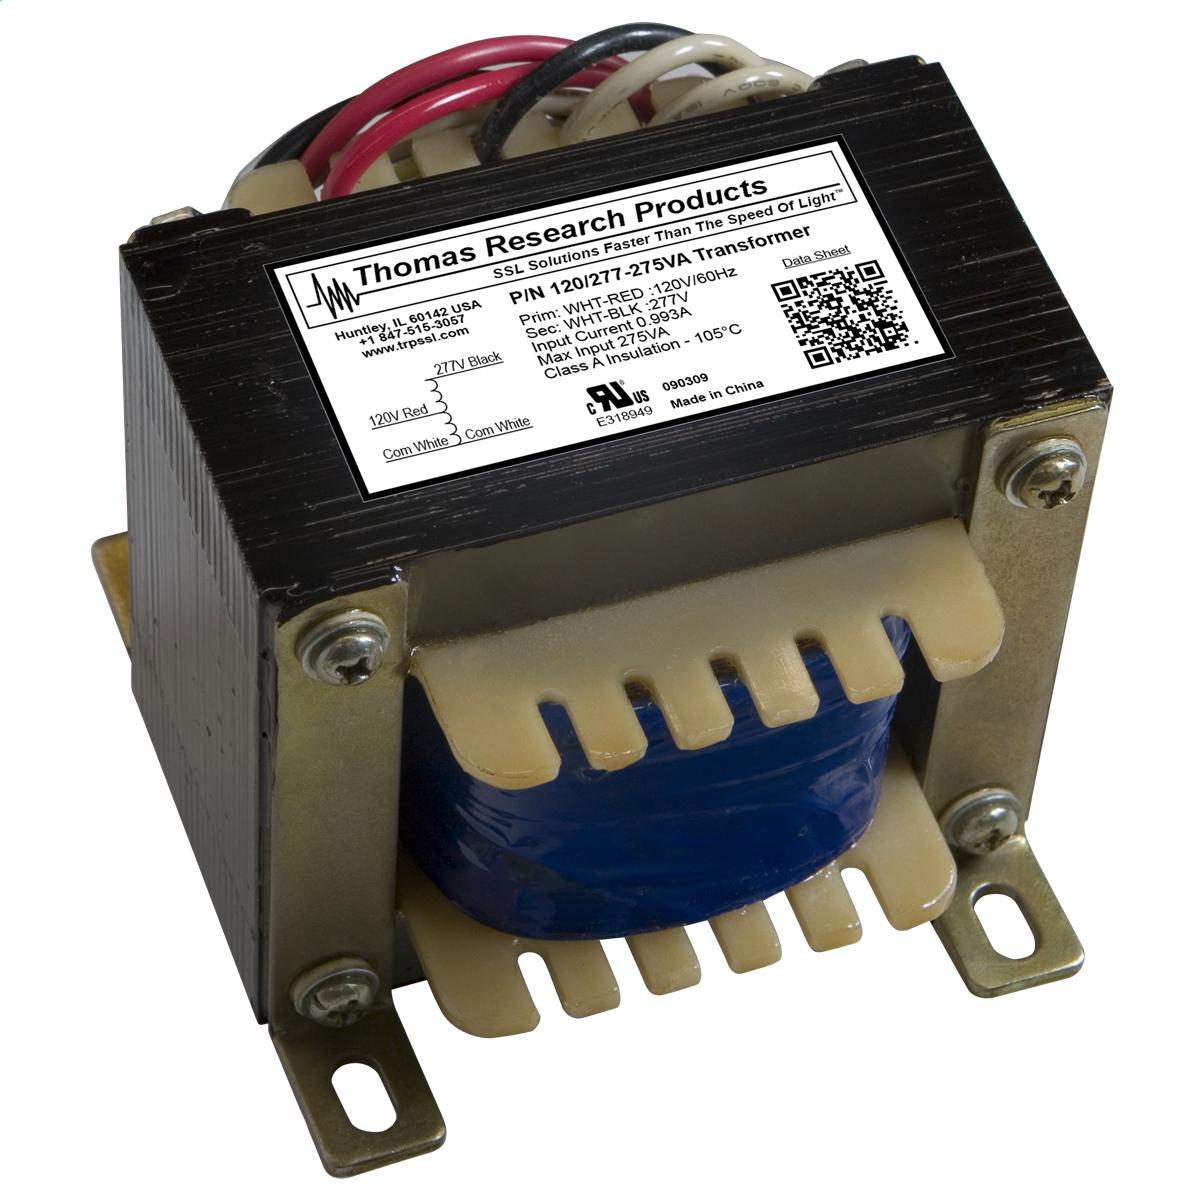 277v to 120v transformer wiring diagram swallowing food 480 347 277 460va brand hubbell